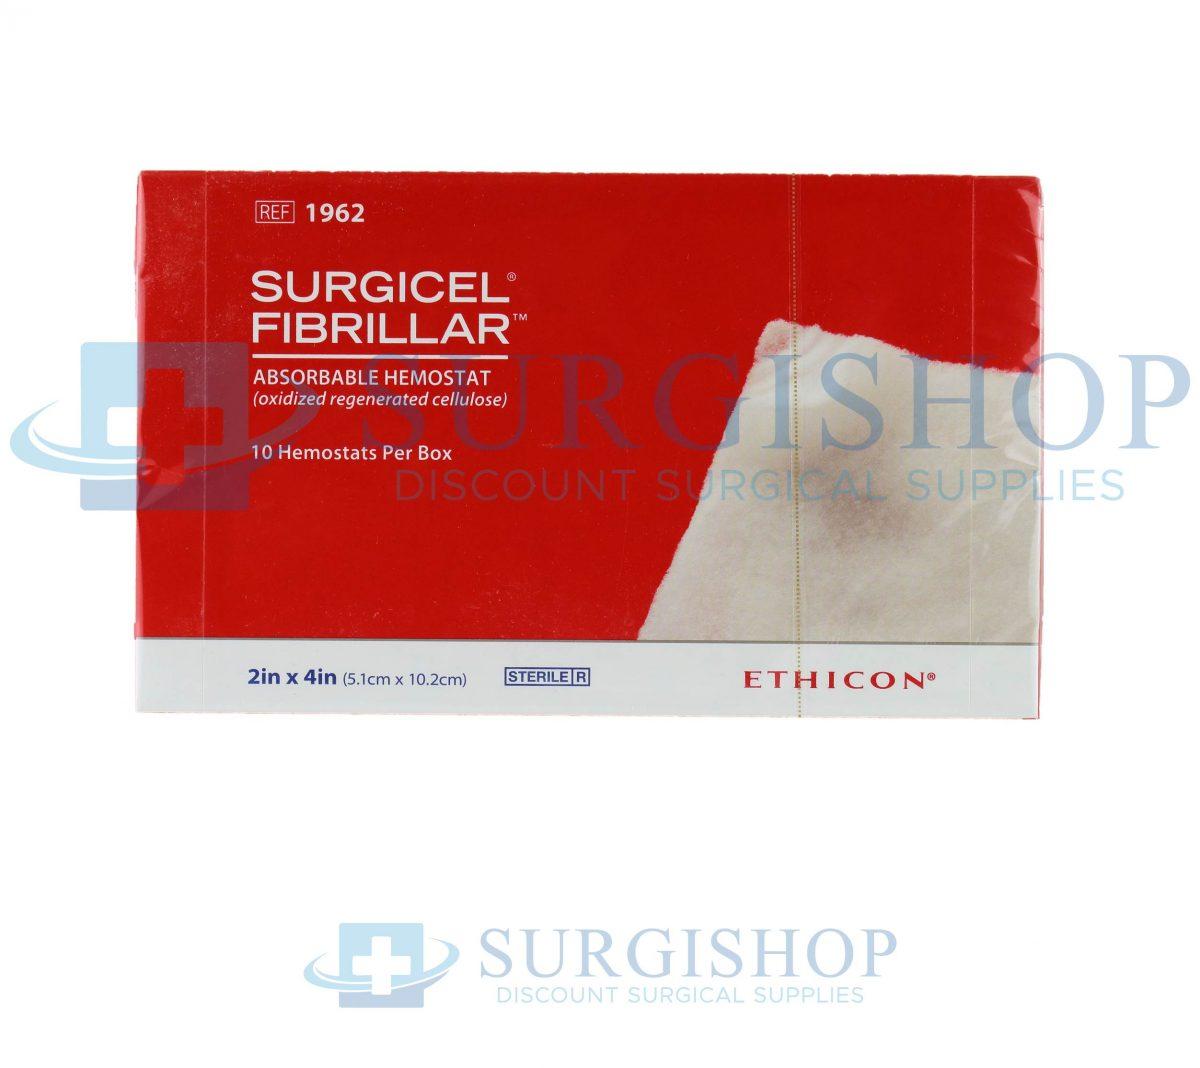 Ethicon Surgicel Fibrillar Absorbable Hemostat 2.0in x 4.0in (5.1cm x 10.2cm)